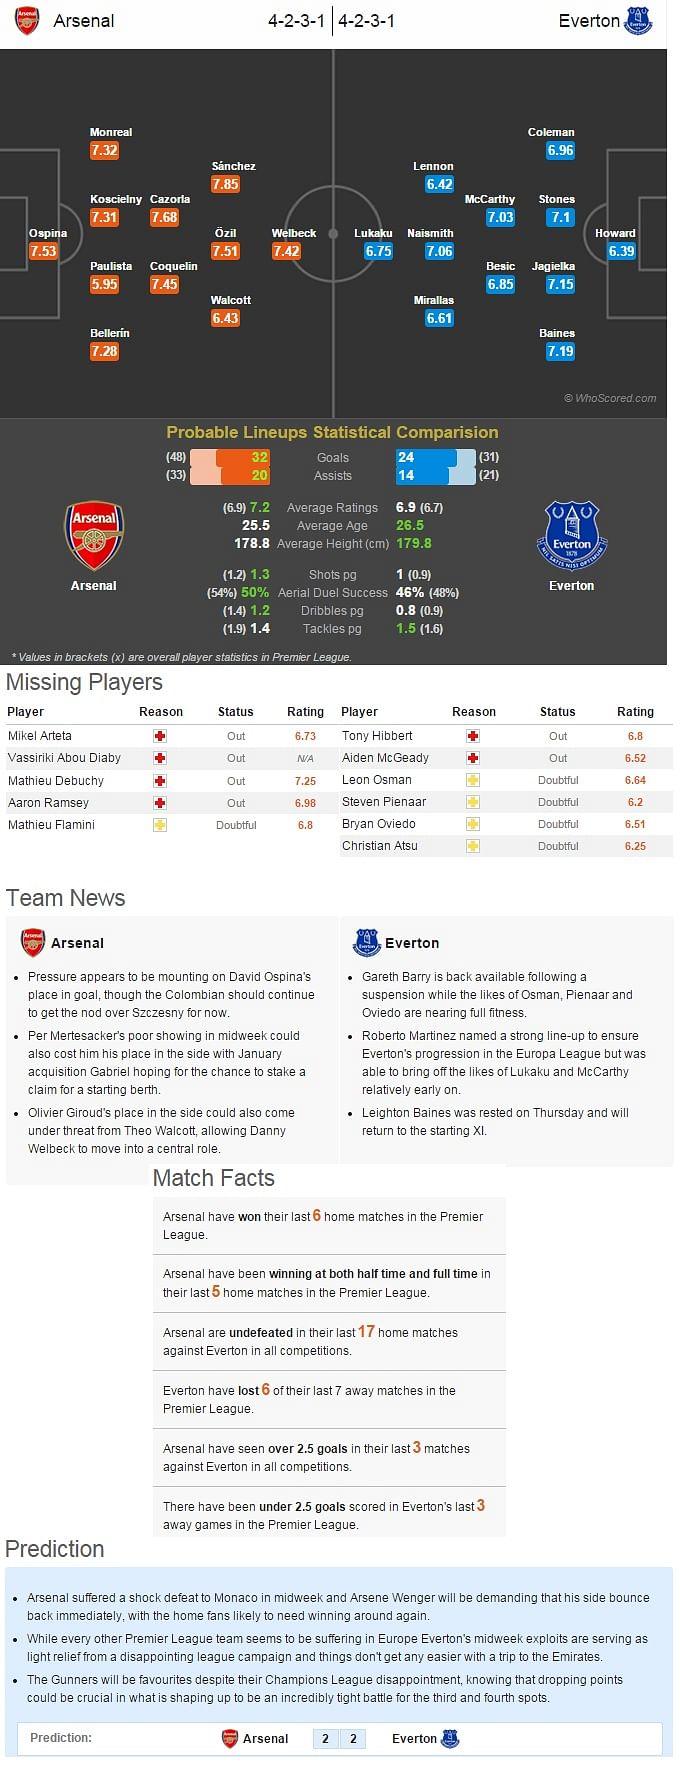 Arsenal vs Everton - Statistical Preview